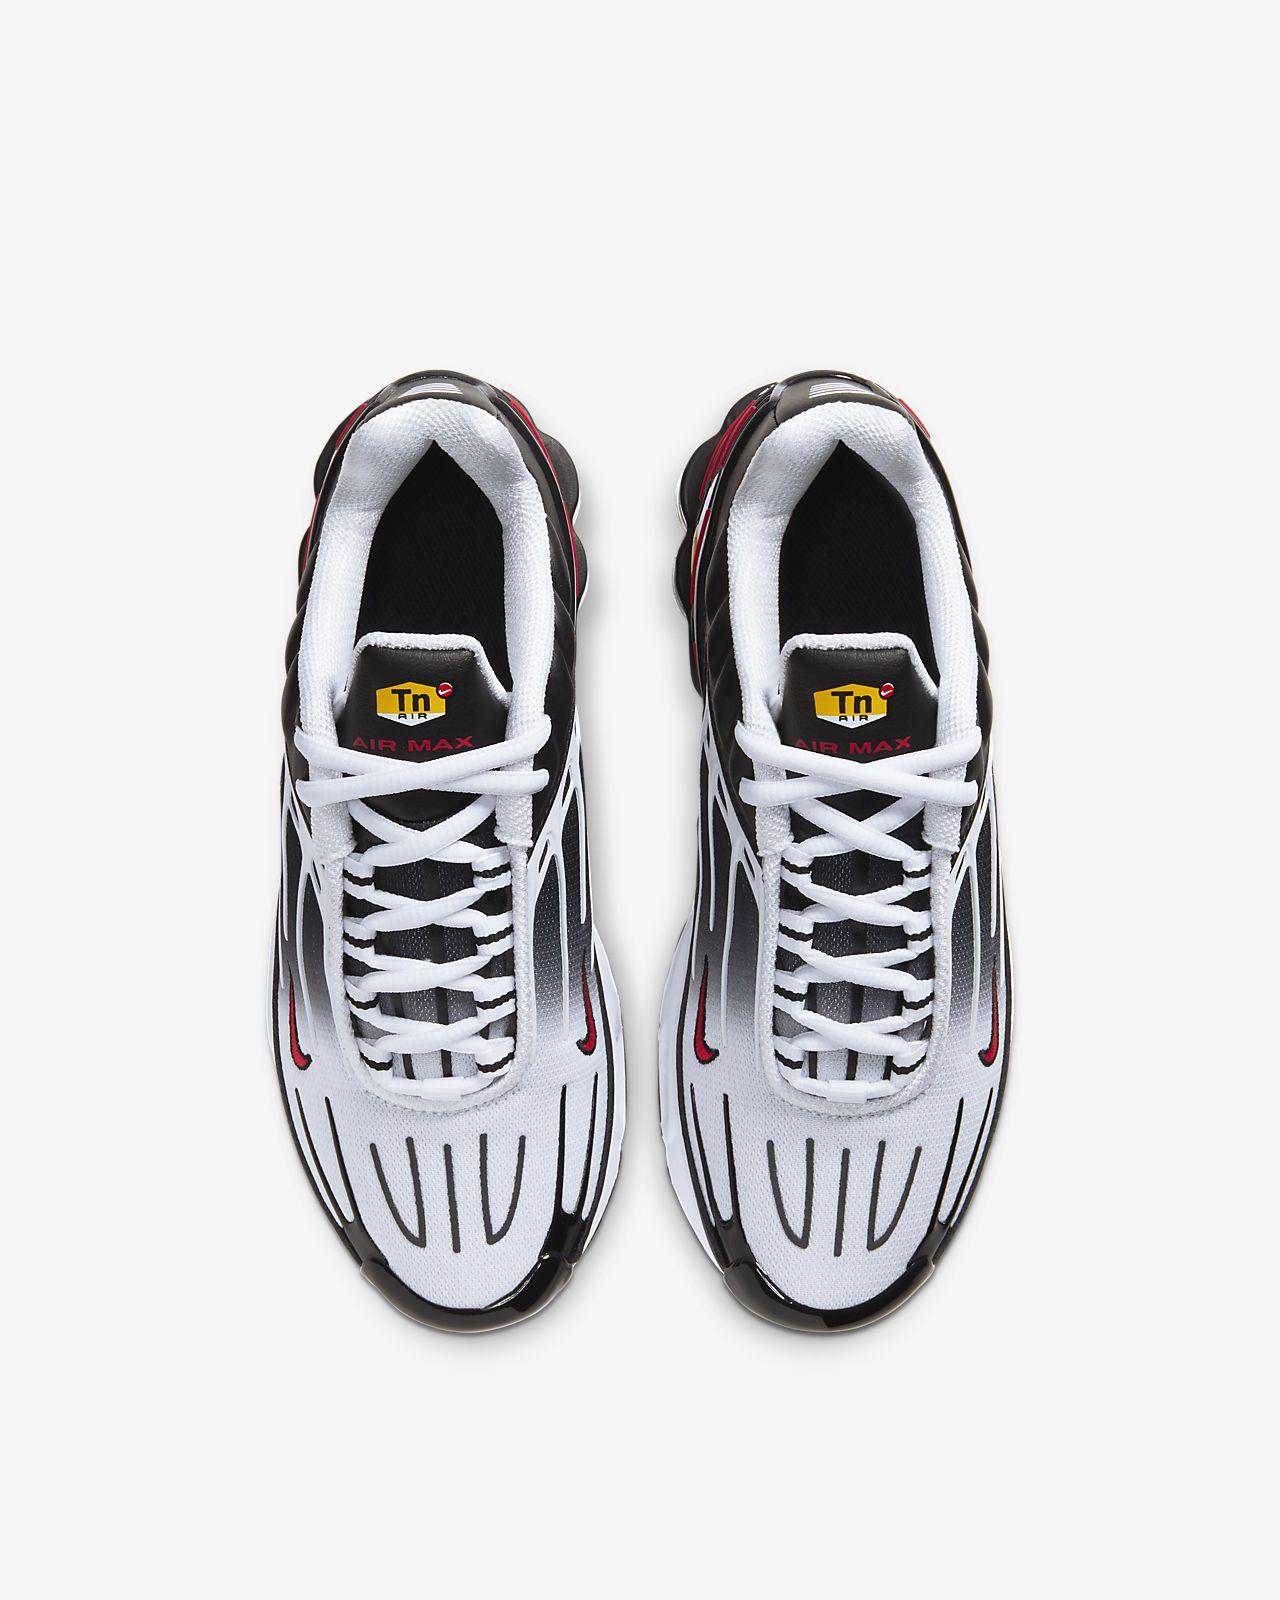 Nike Air Max Plus 3 Schuh für ältere Kinder